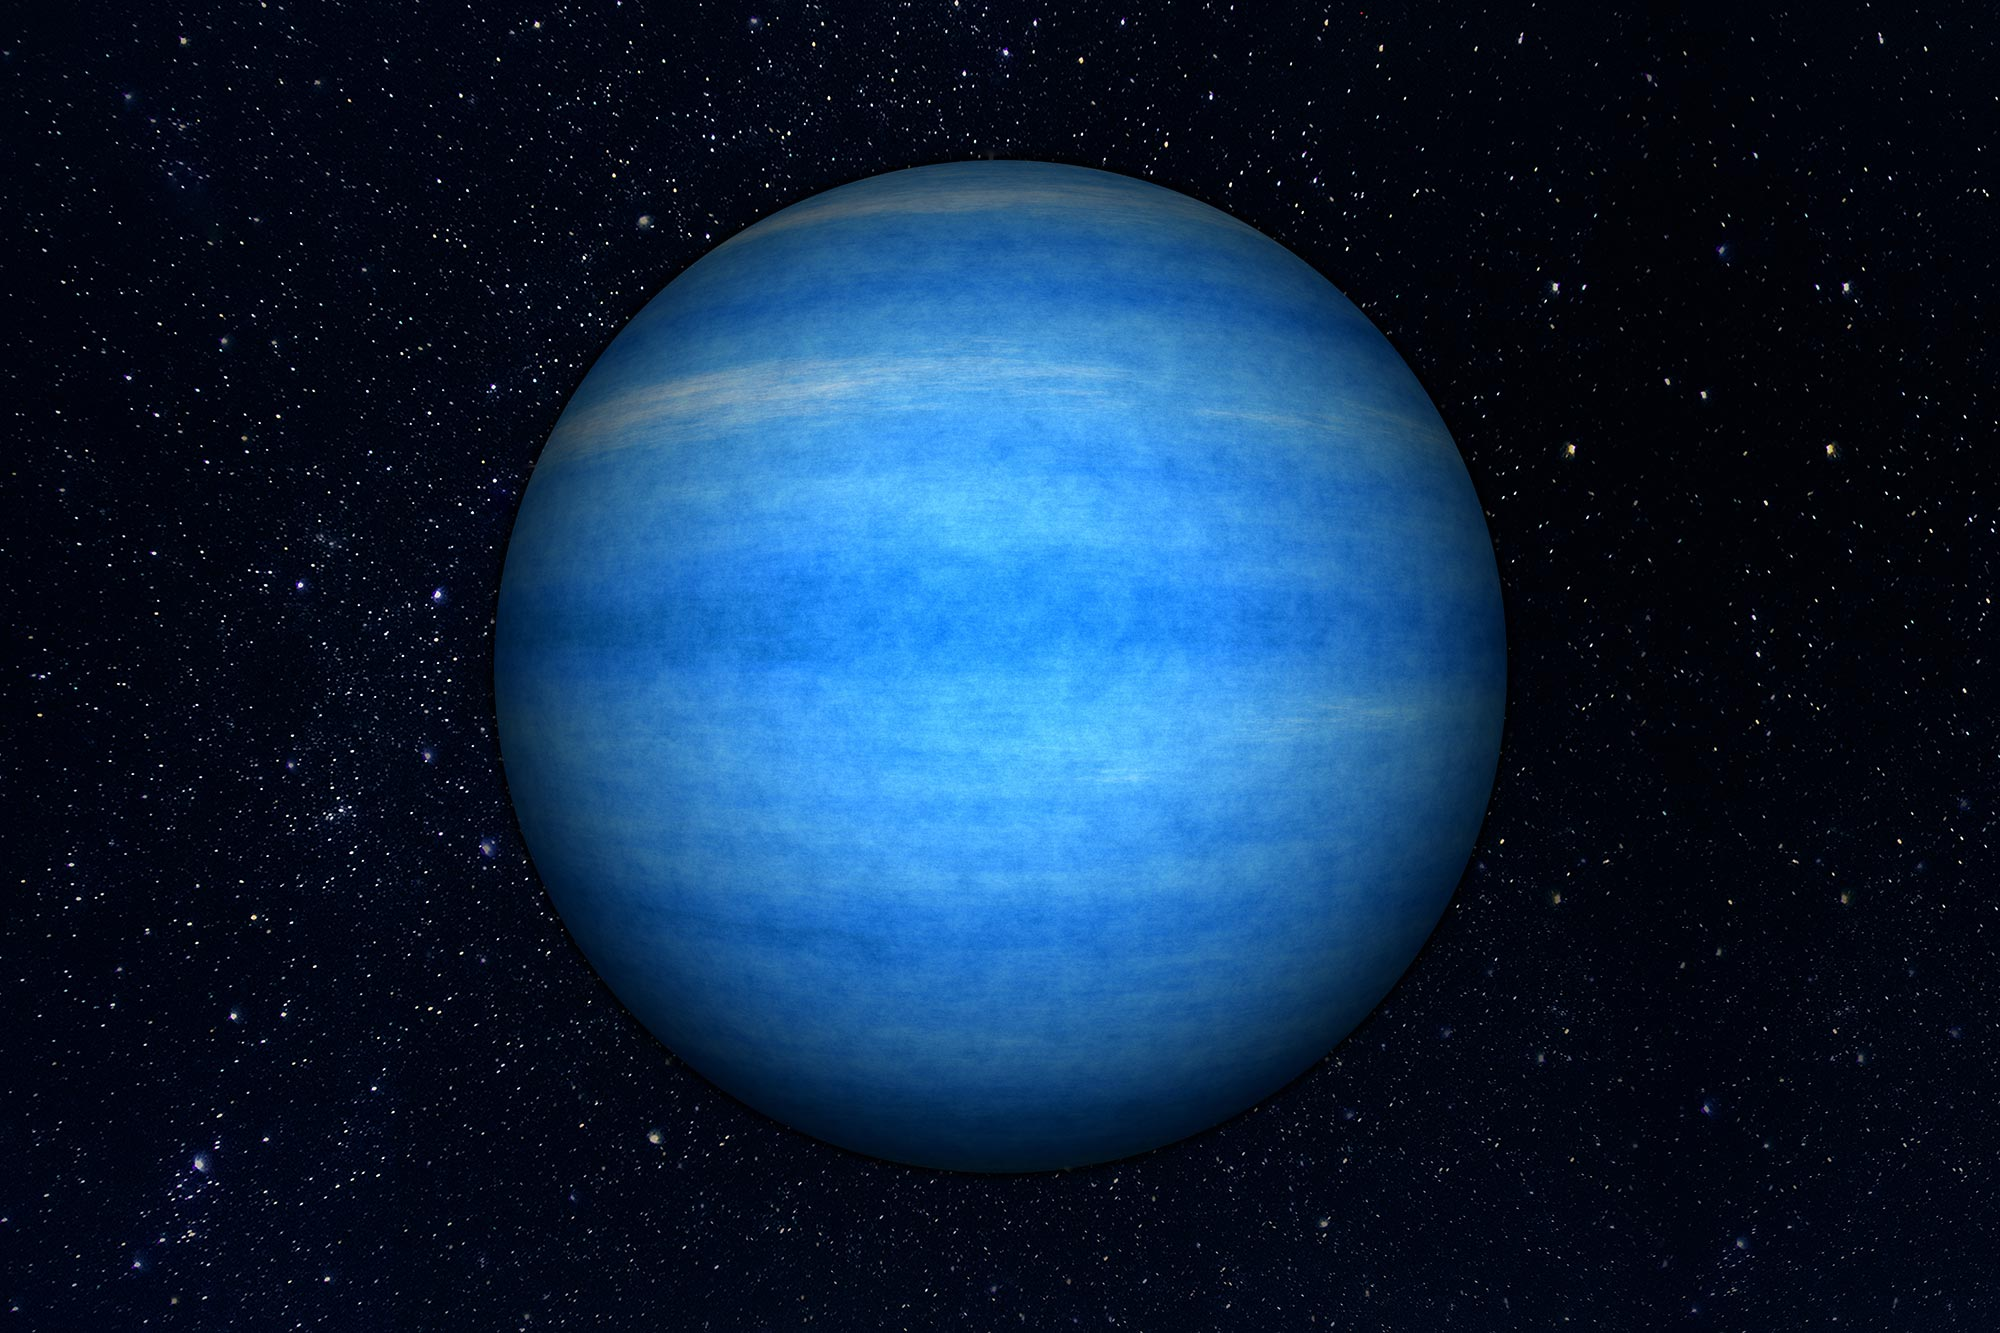 New Minor Planets Discovered Beyond Neptune Using Dark